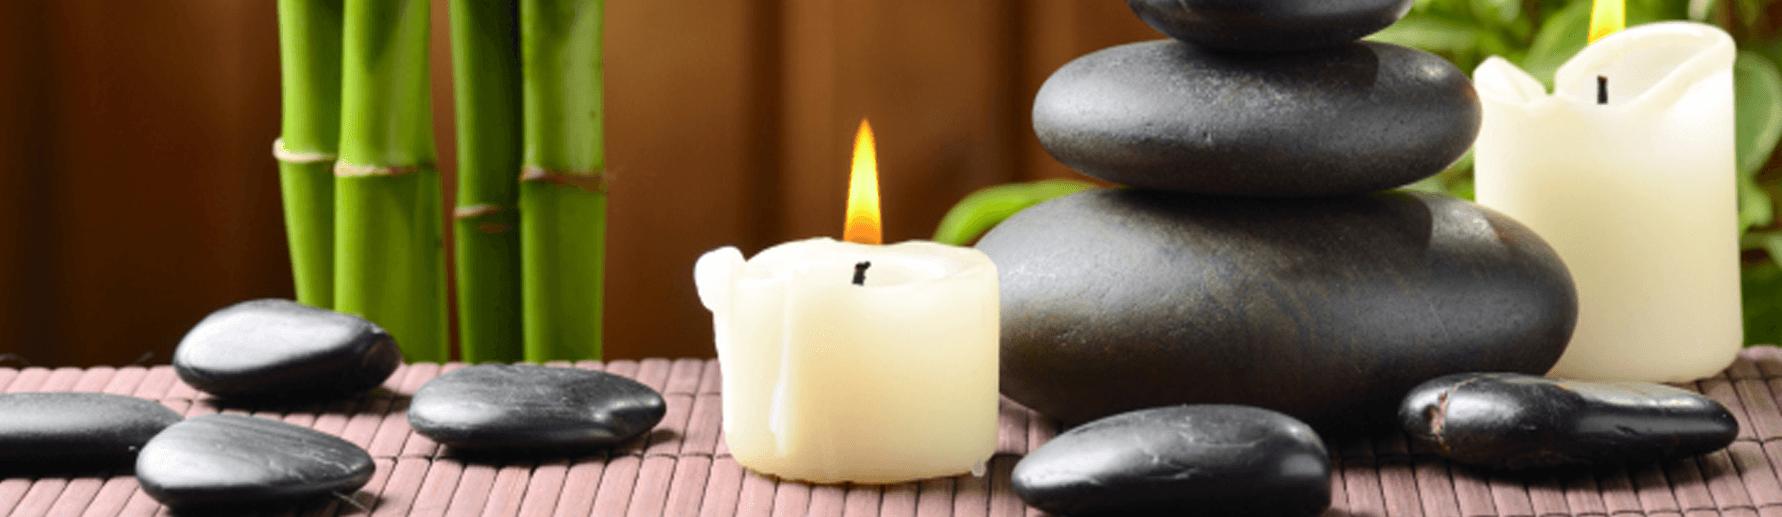 10 tips b sicos de feng shui para decorar tu hogar for Tips de feng shui para el hogar